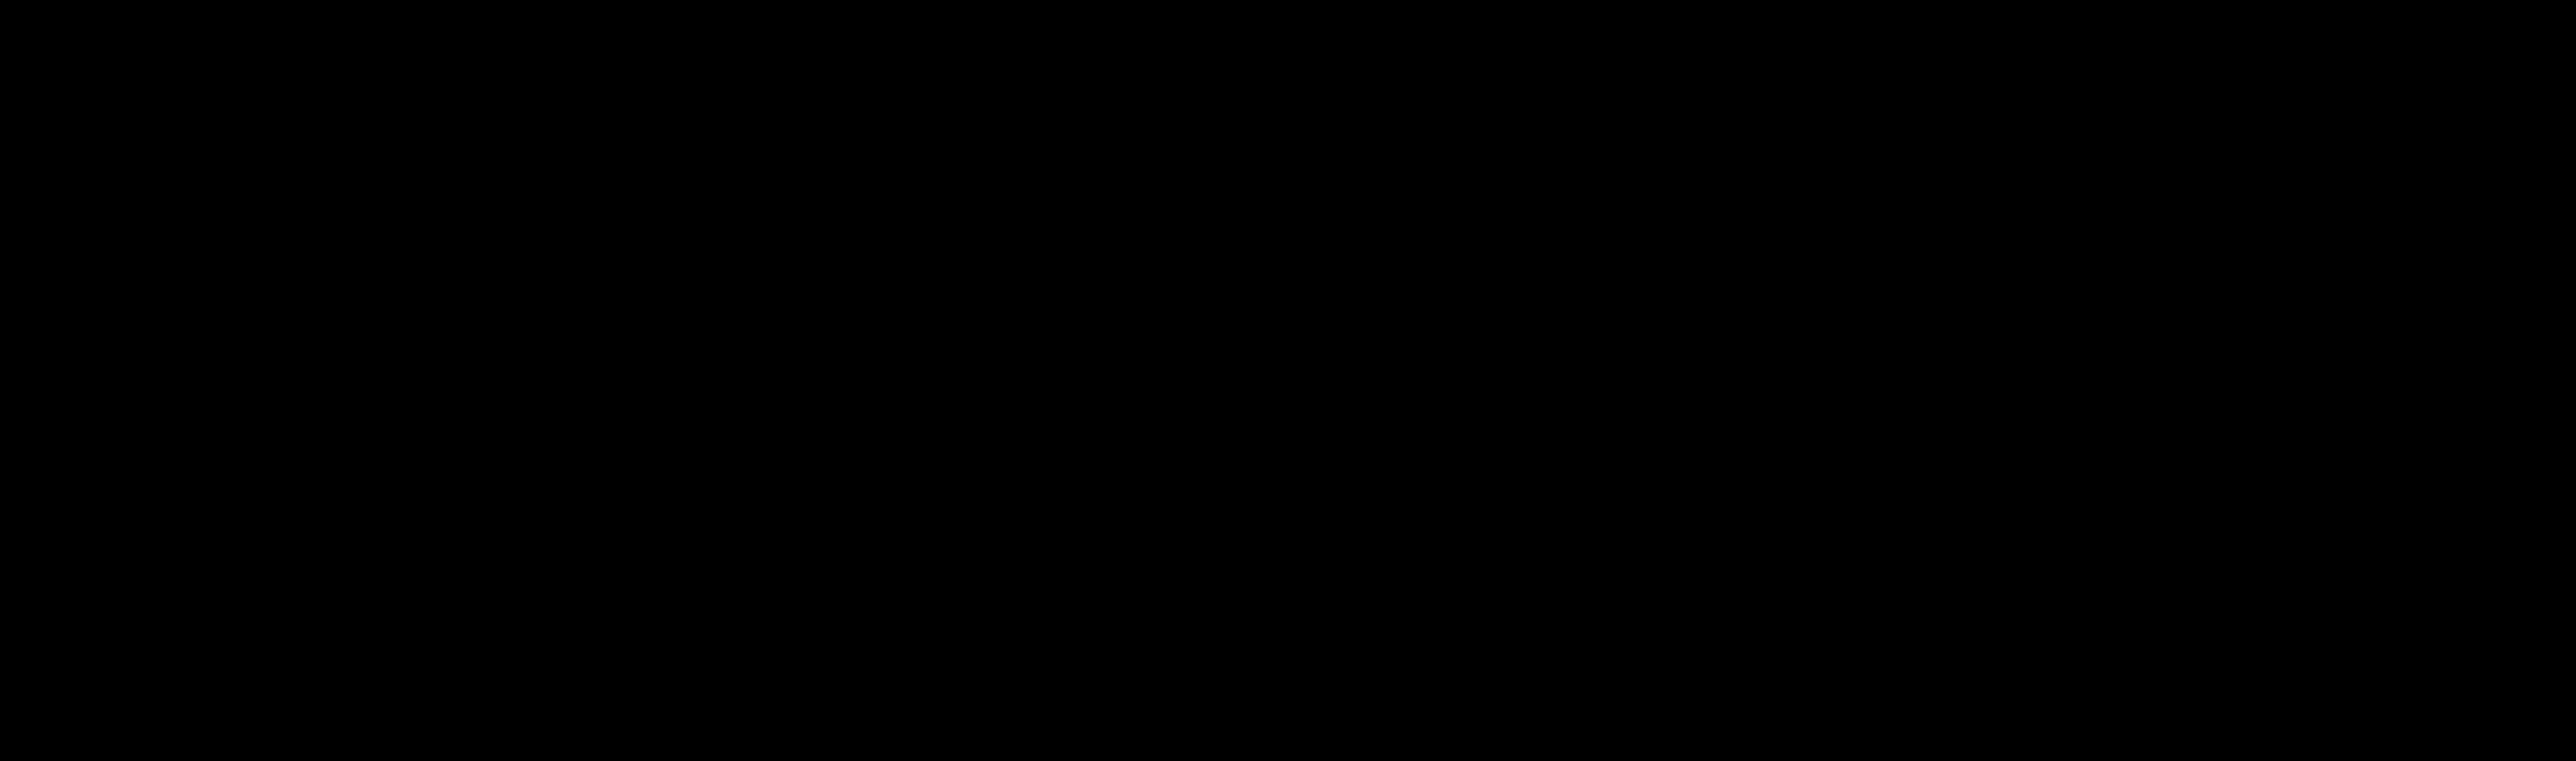 Womens_Wear_Daily_Logo